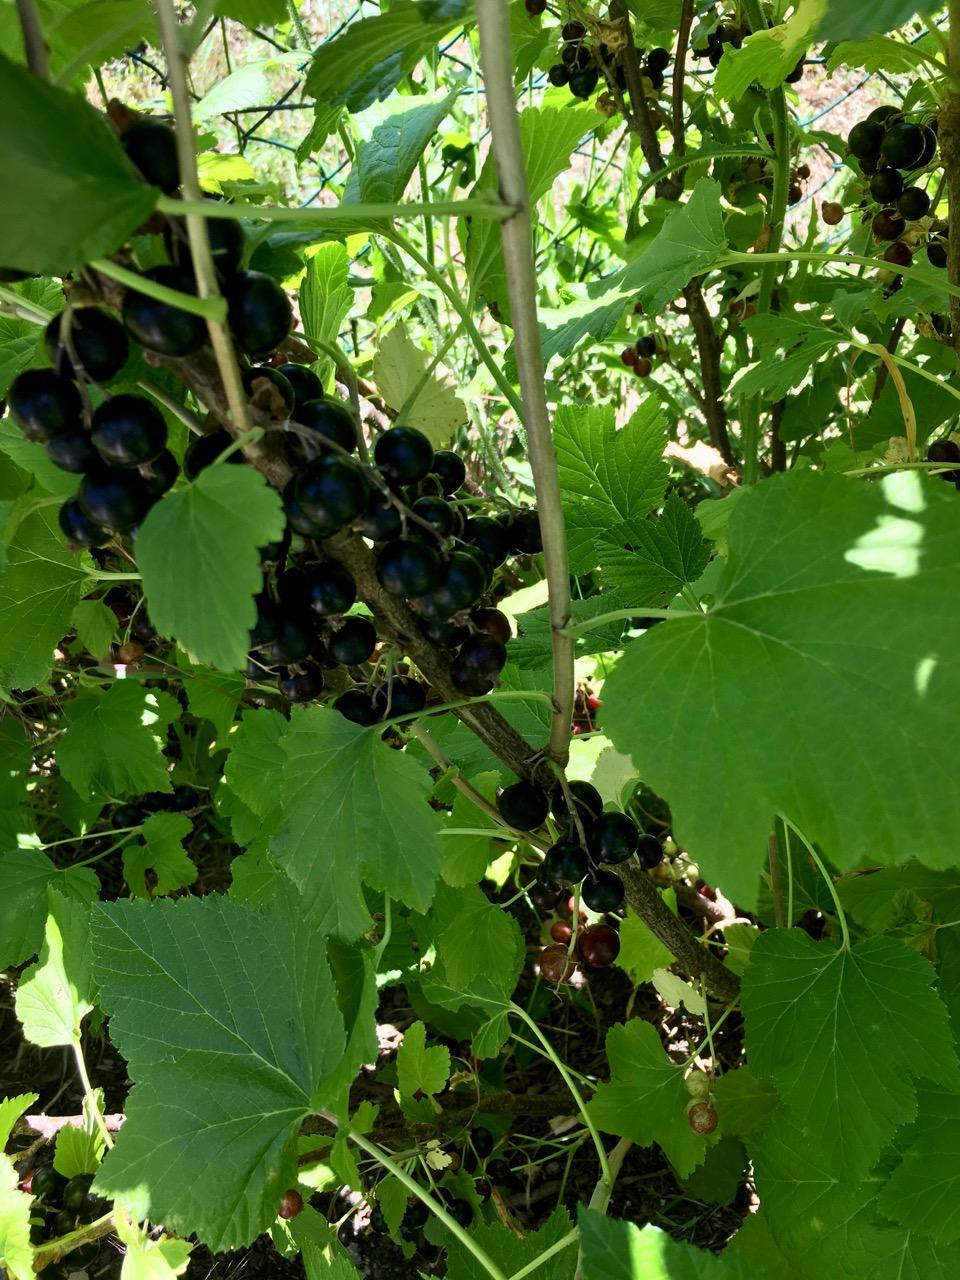 Blackcurrants heavy on the sole bush